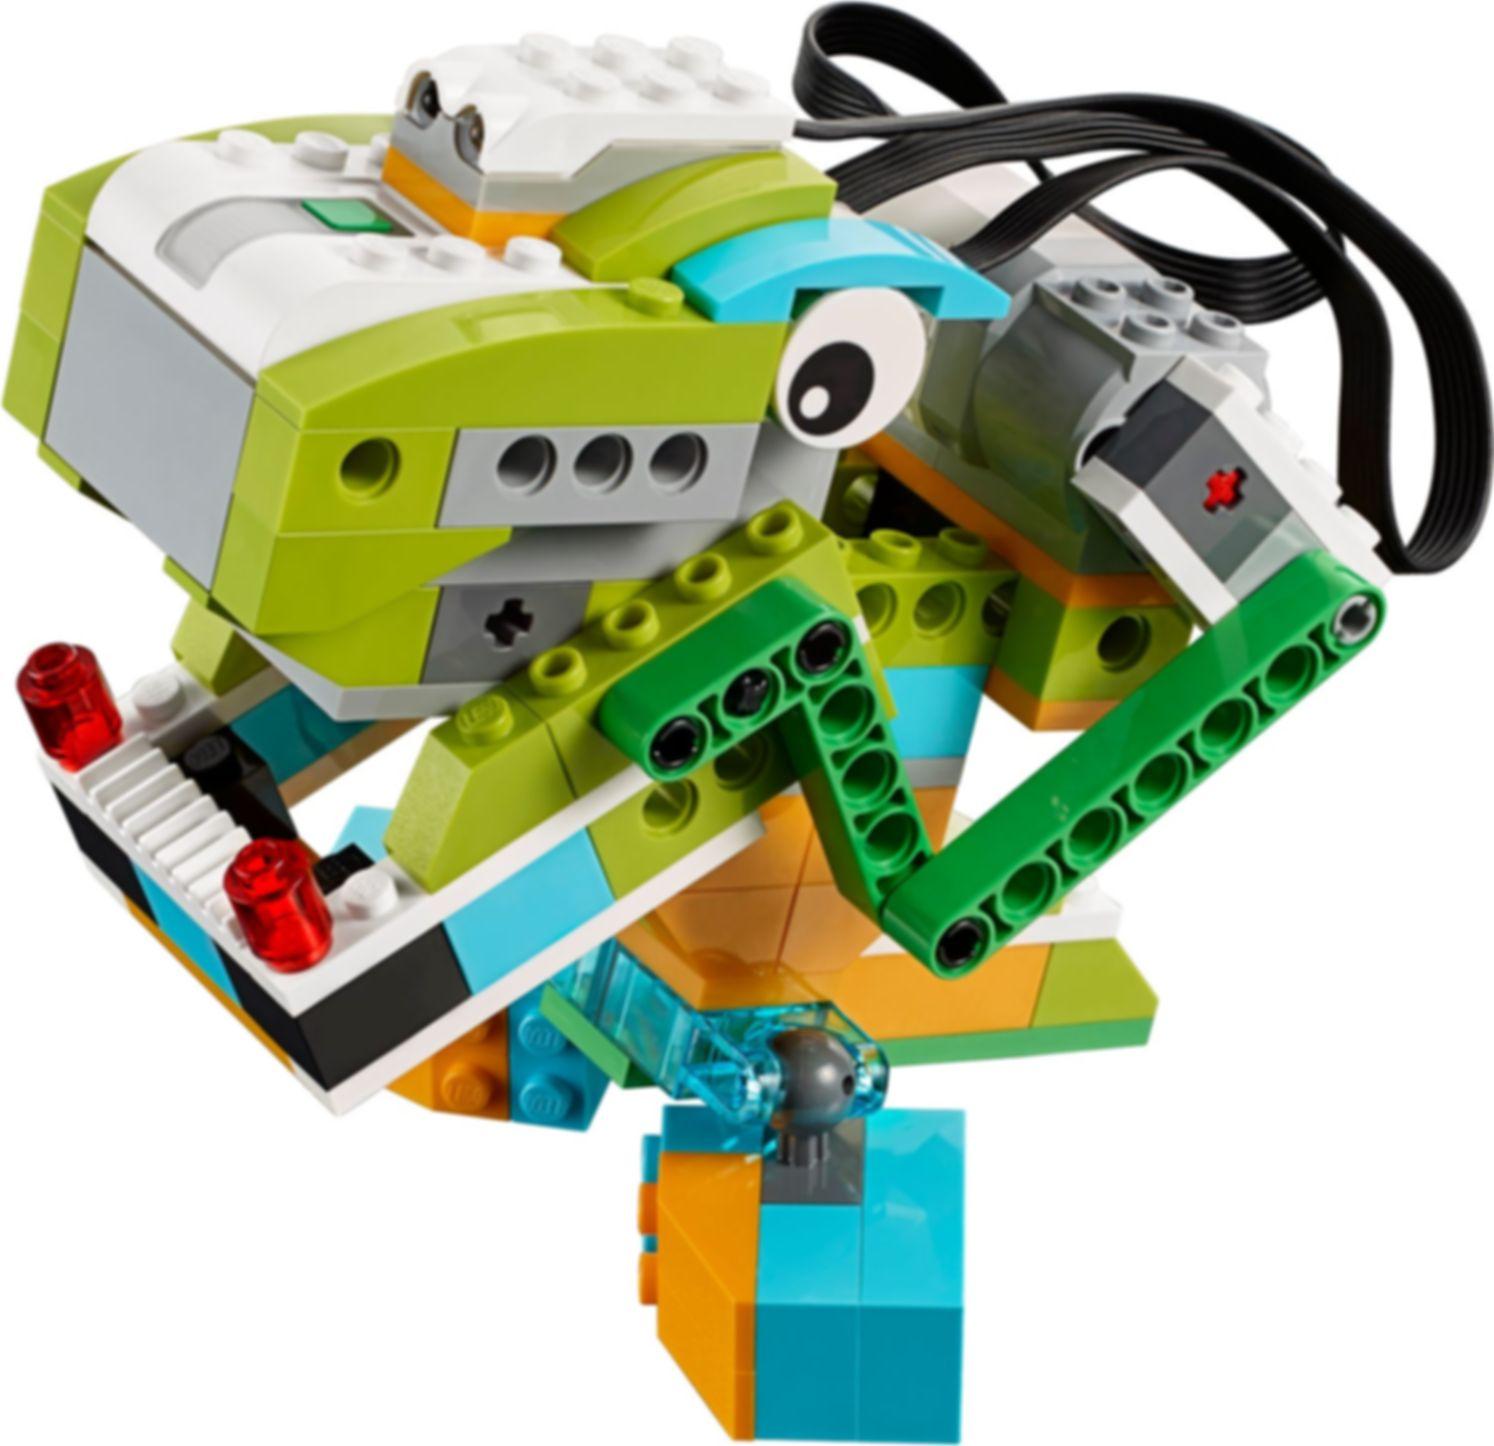 WeDo 2.0 Core Set components